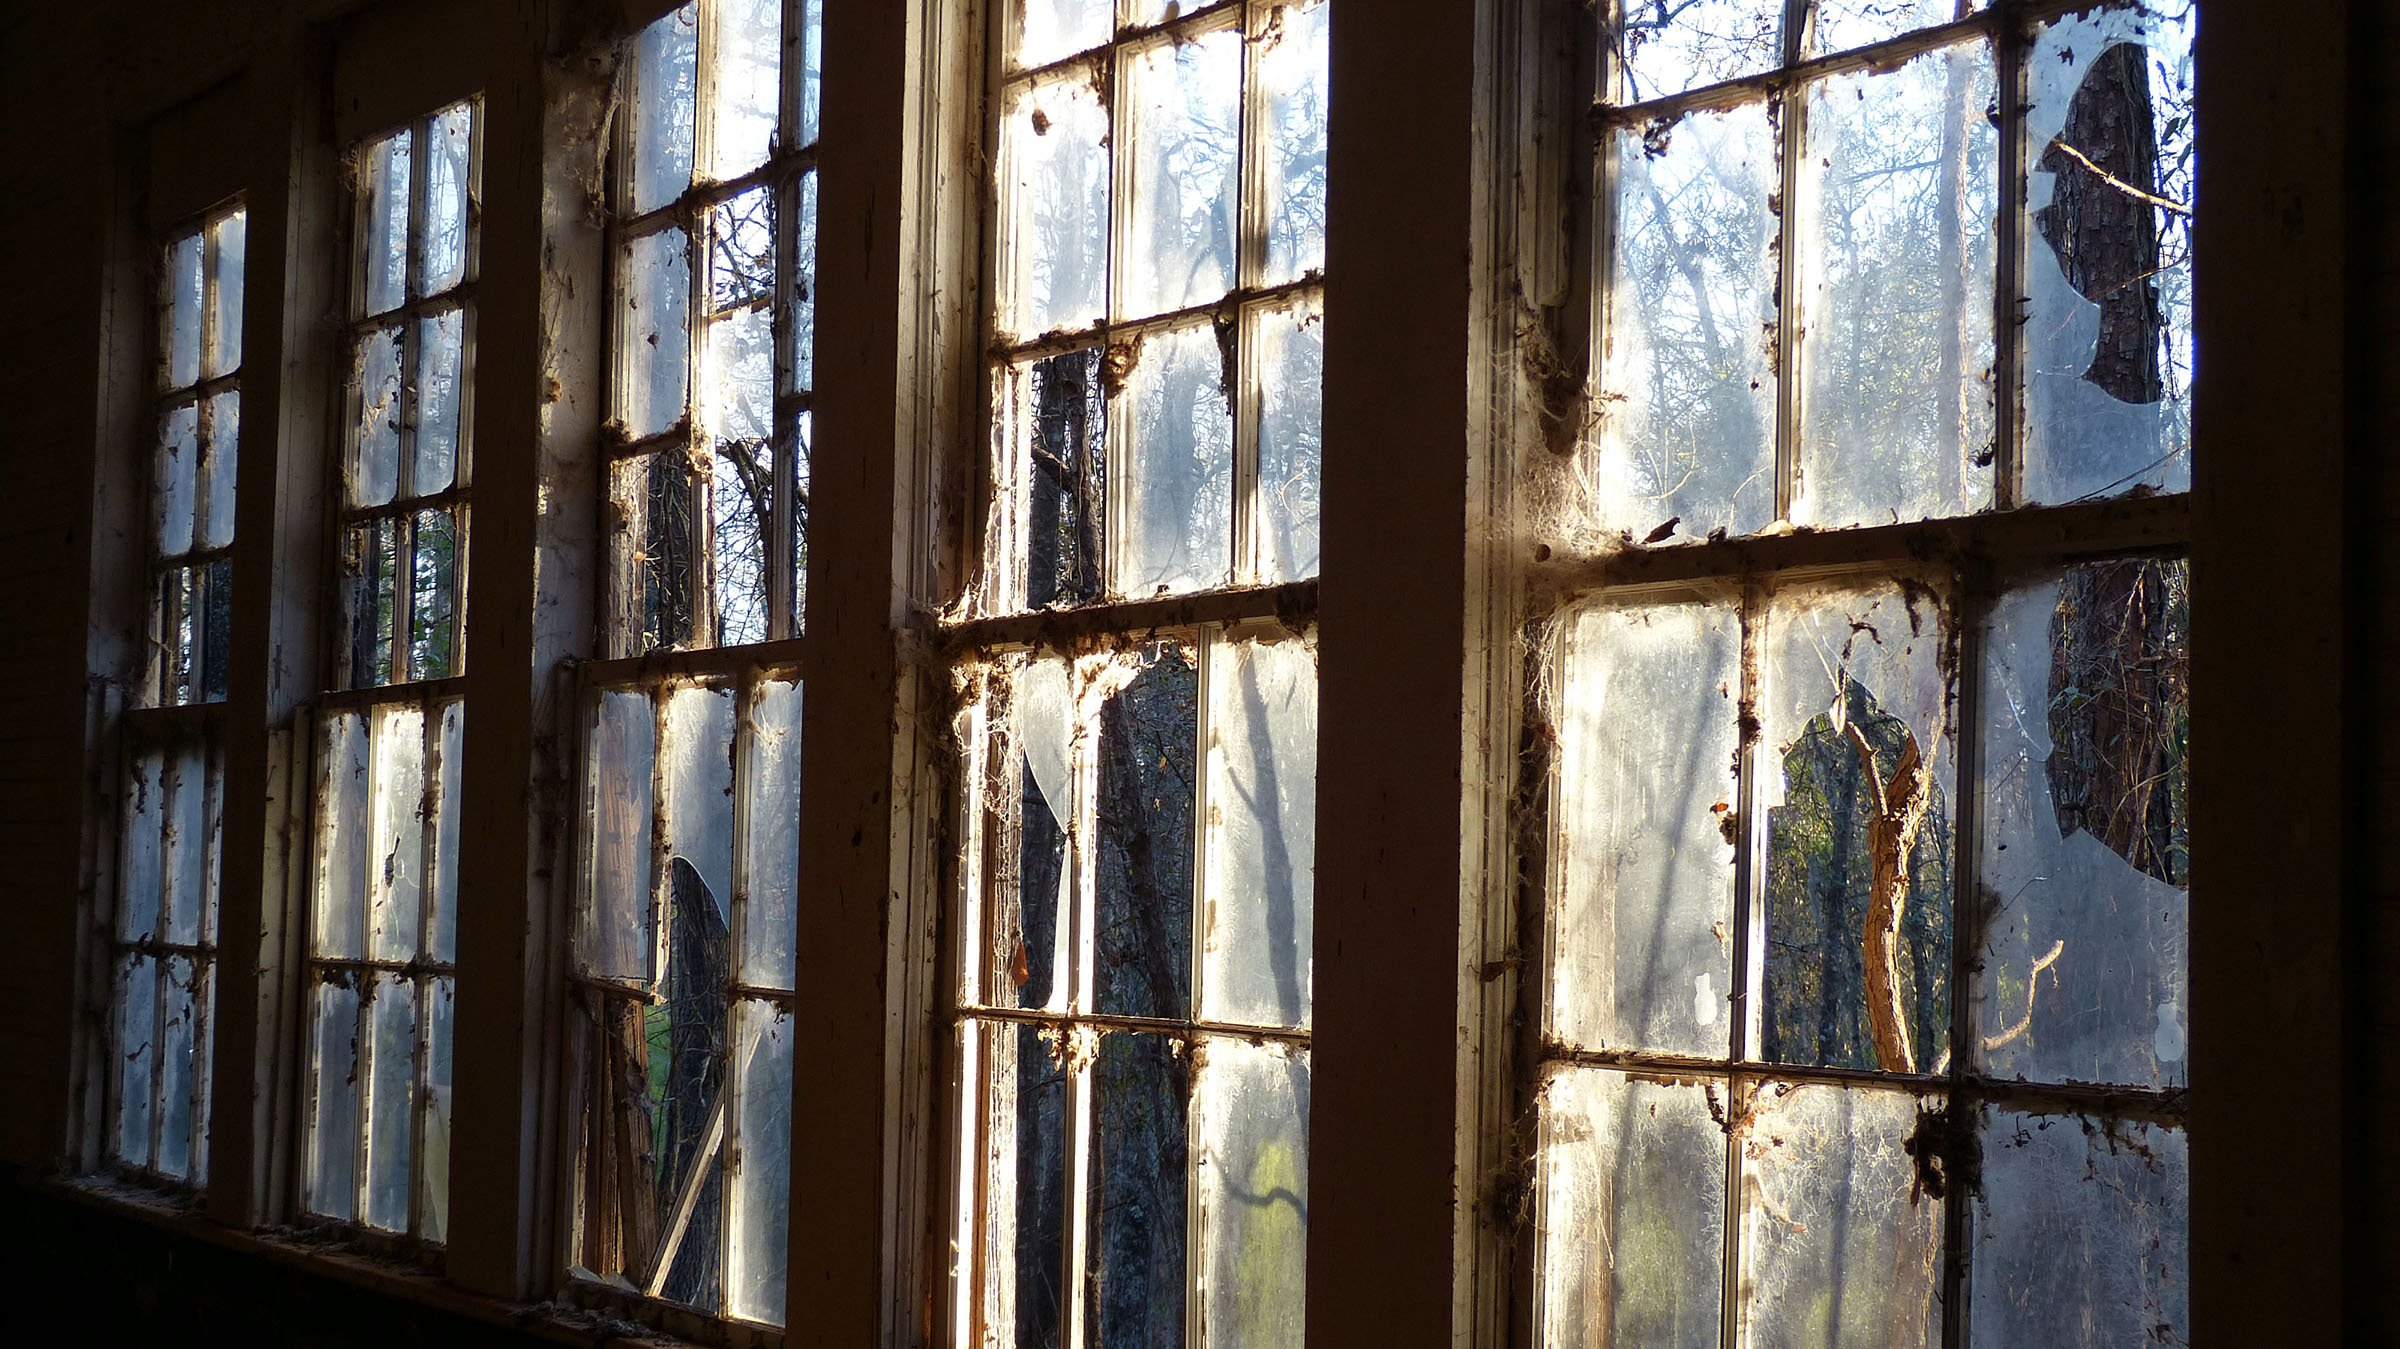 """Eden Church Ribbon of Windows, Louisville, Georgia"" by Kathleen Galvin, 8x4.5, December 2017"